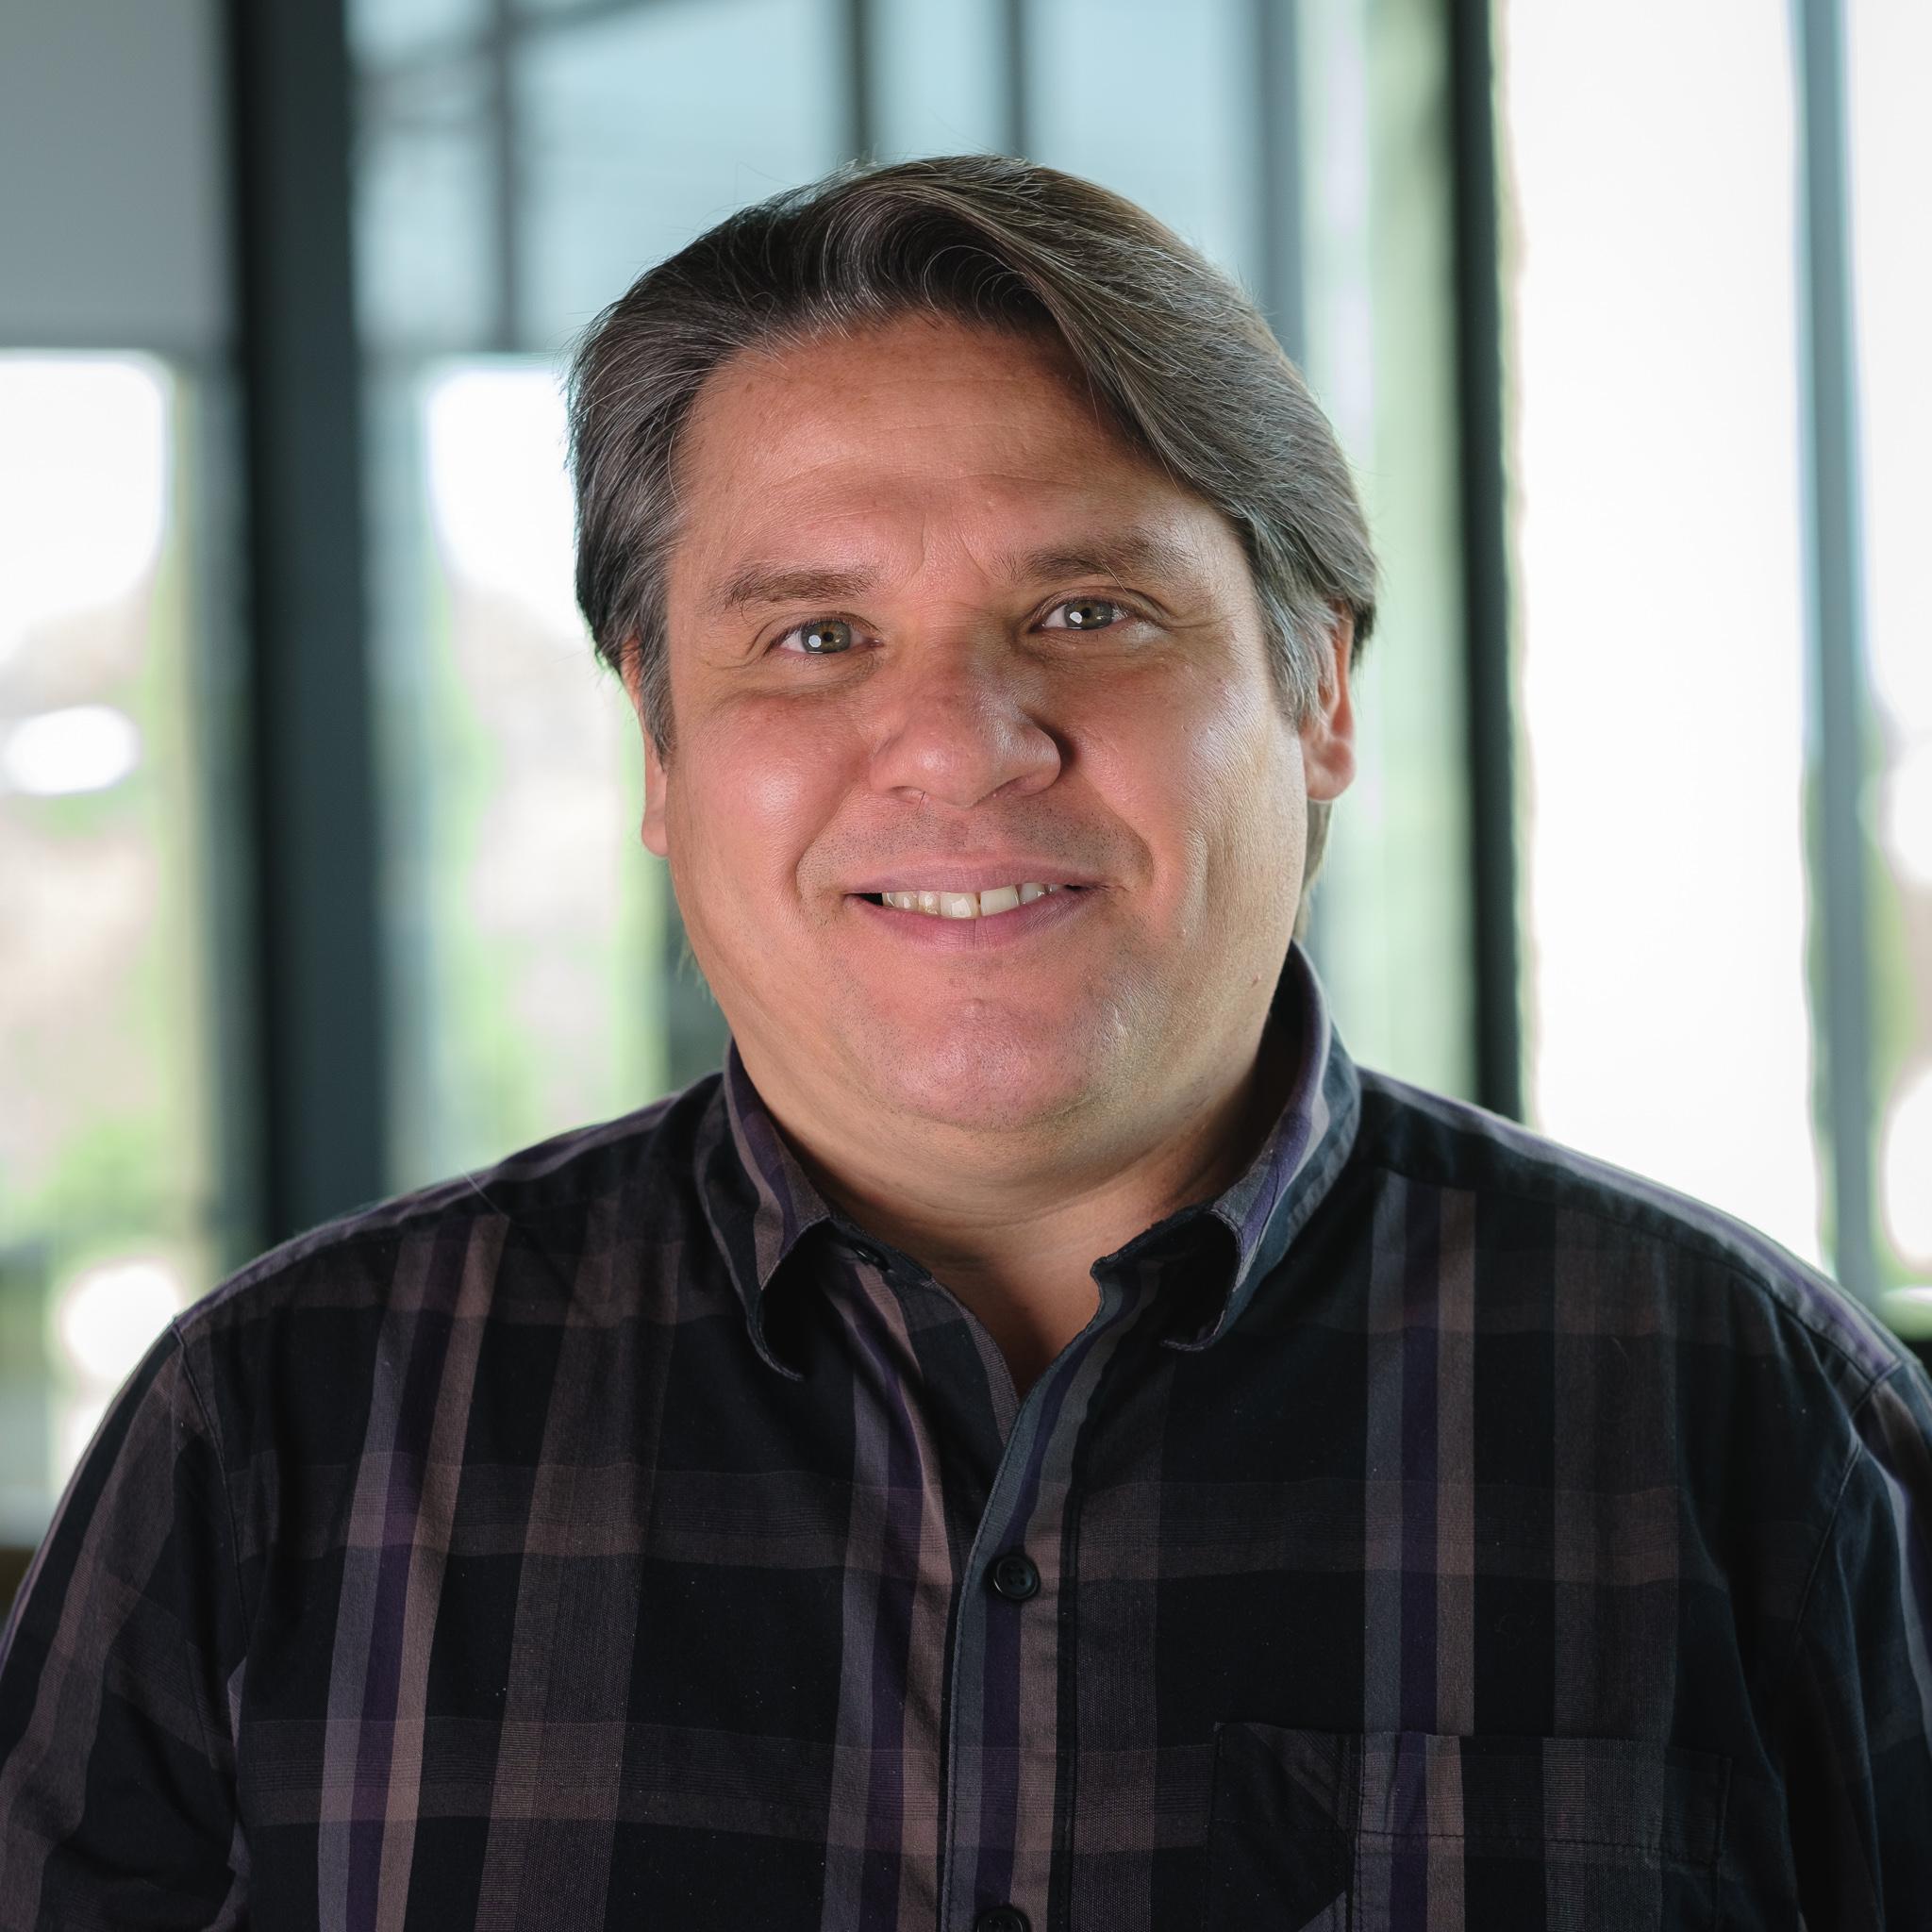 Armando Orisini - Associate